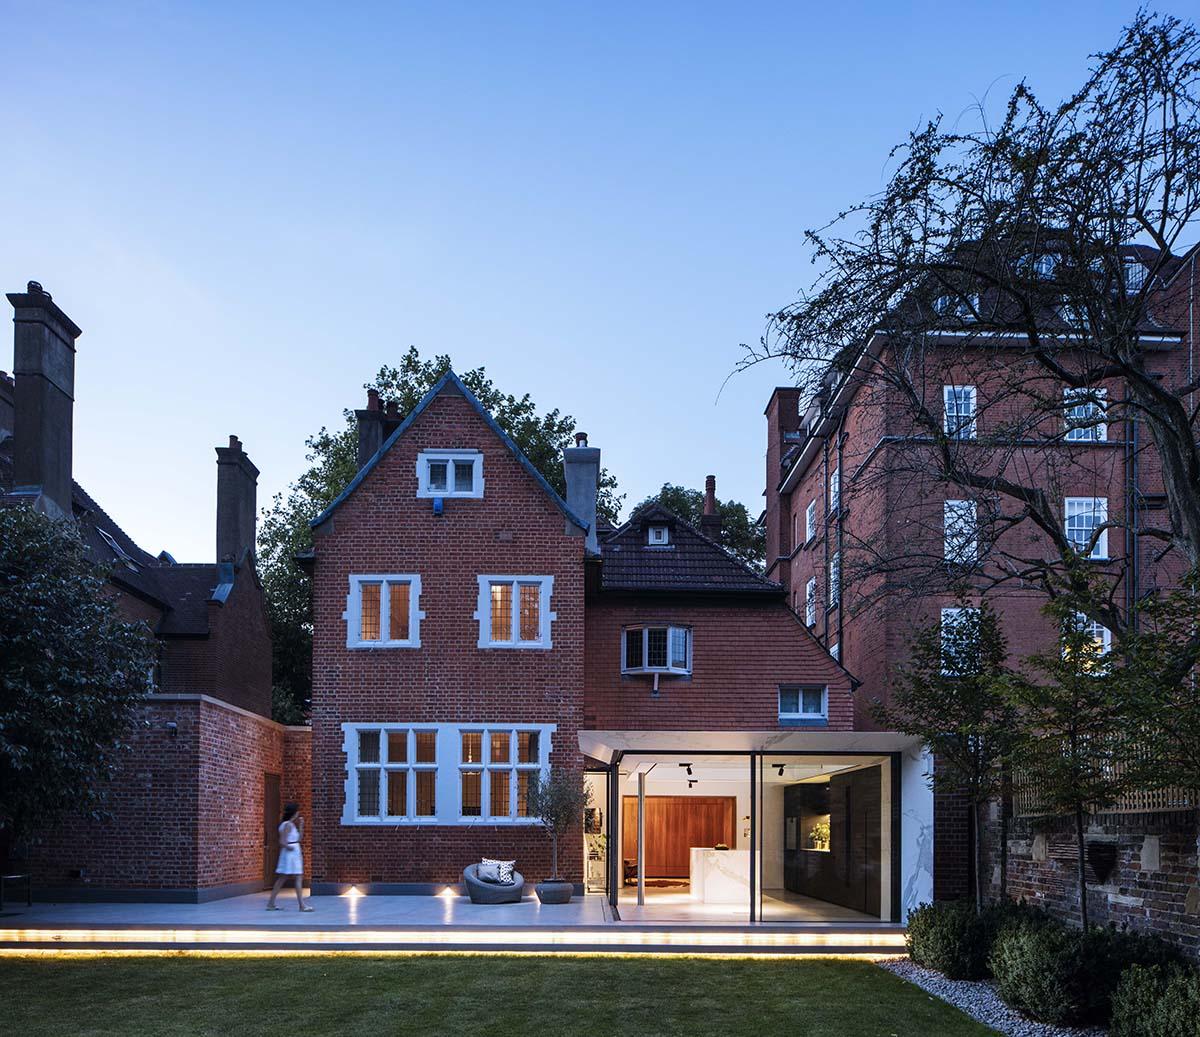 Wedderburn Road / Finkernagel Ross Architects